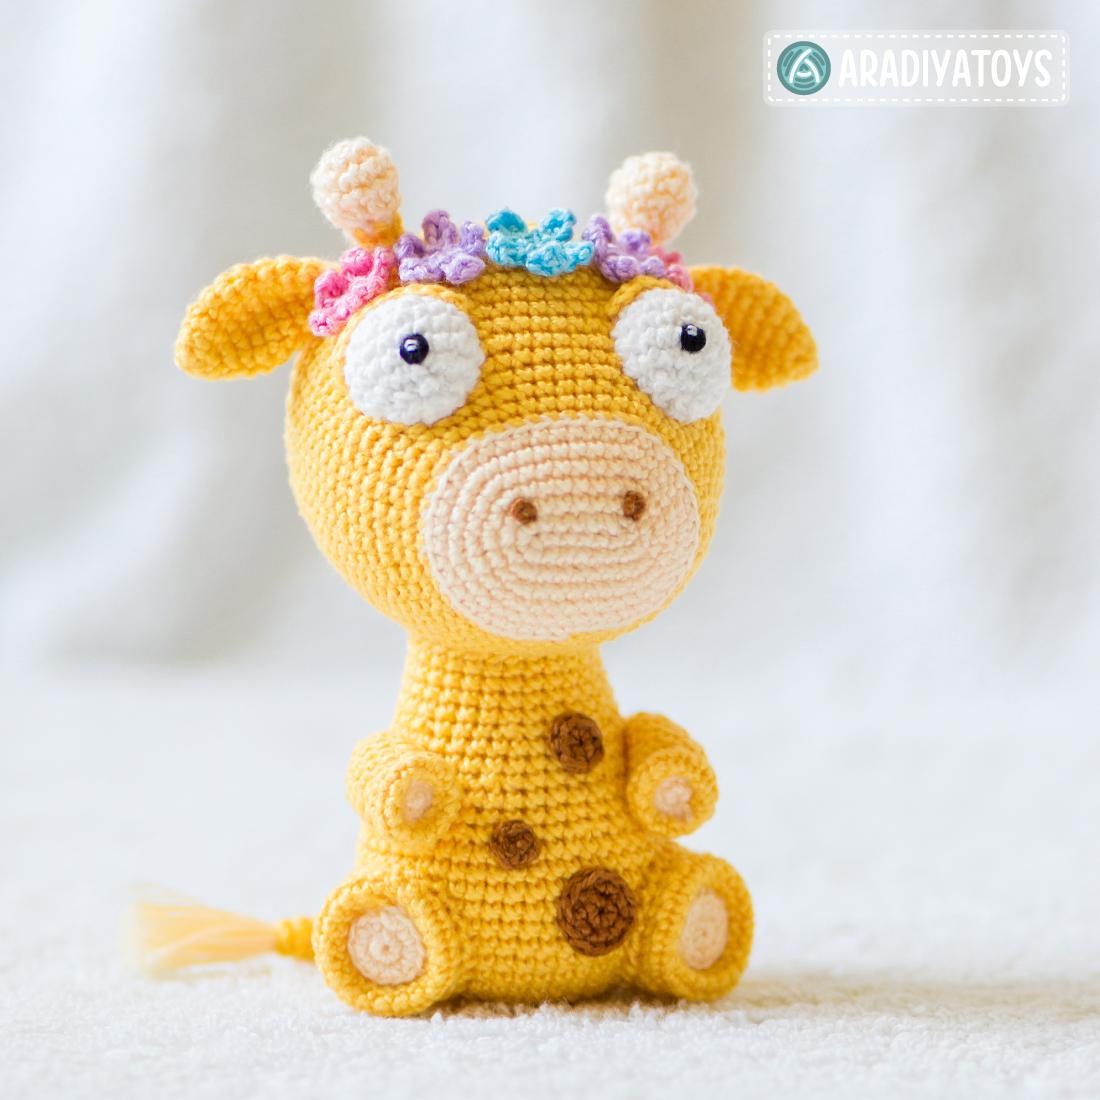 "Modèle au crochet d'Ellie la girafe de ""AradiyaToys Design"""